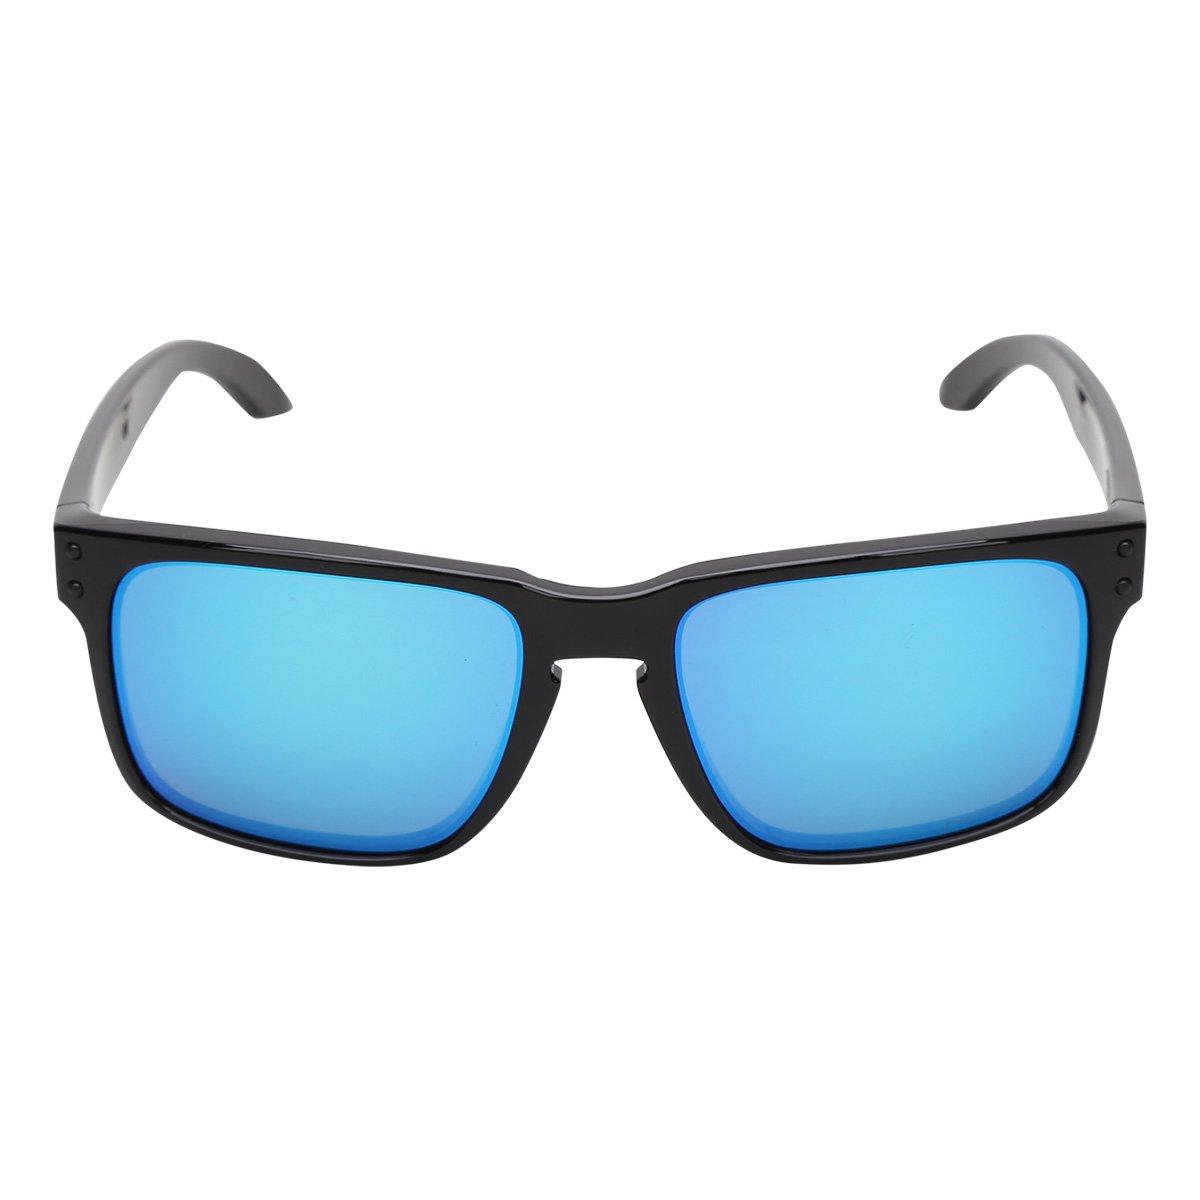 23ef8f78f Óculos de Sol Oakley Holbrook Prizm Tartaruga Masculino | Livelo ...